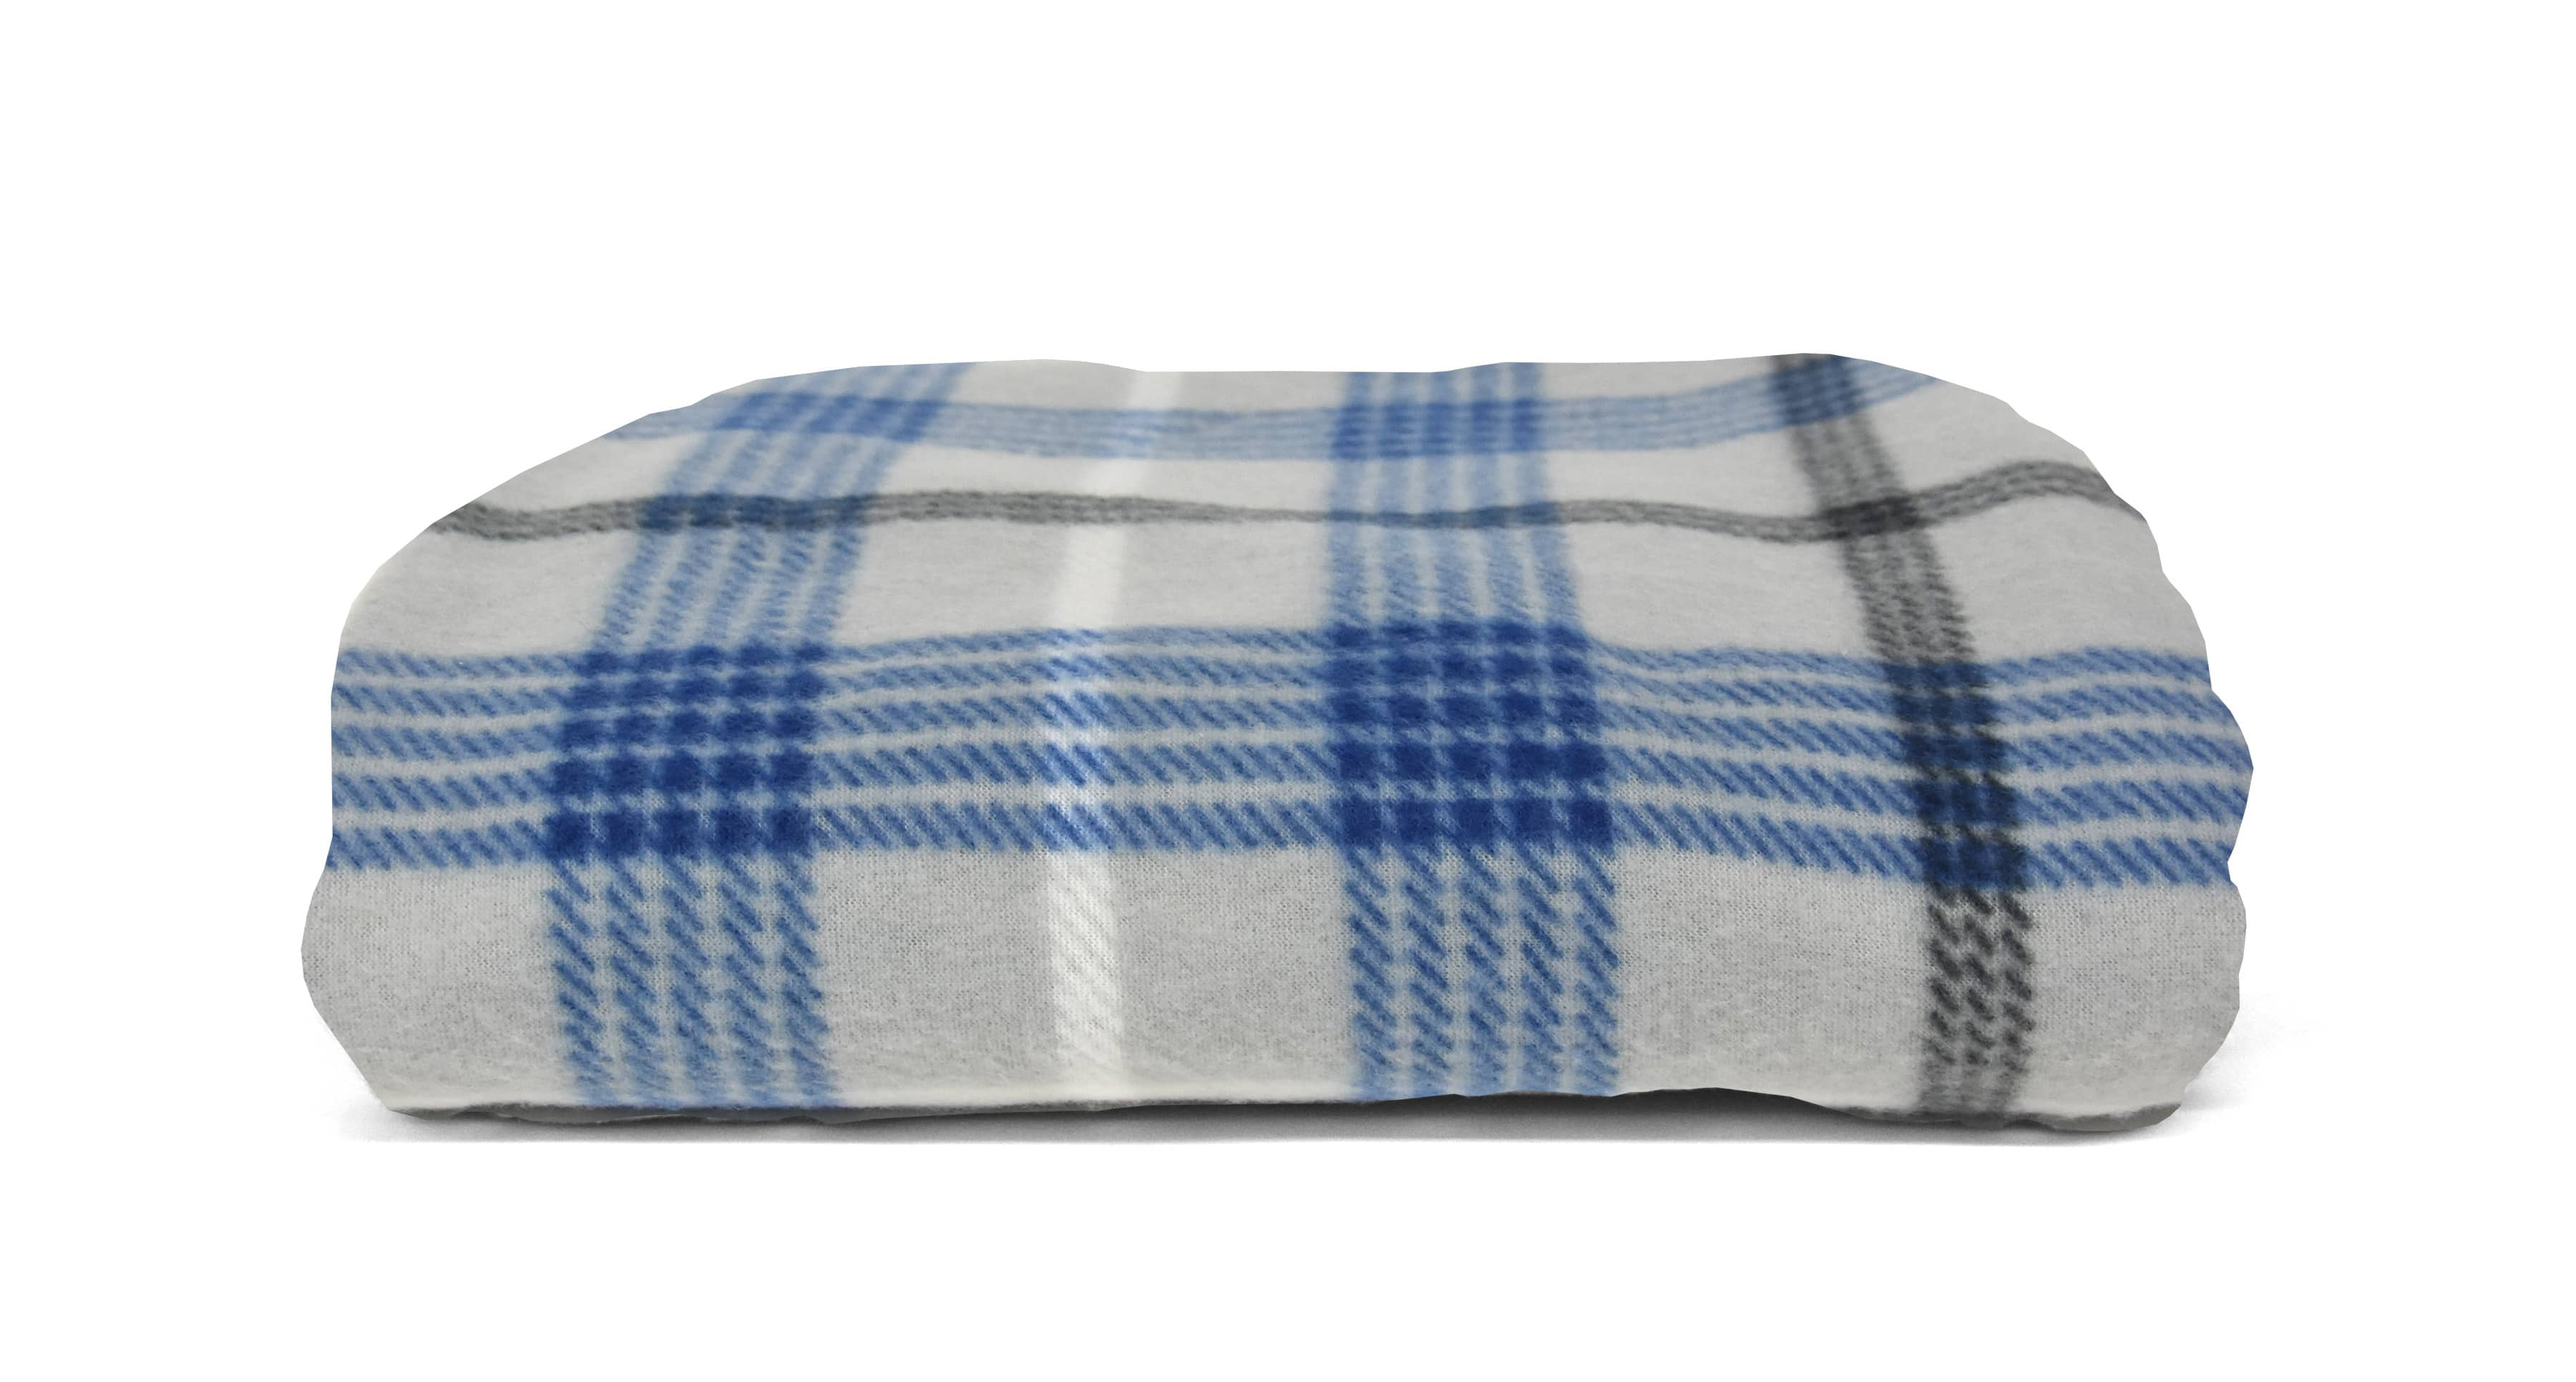 "50"" X 60""  Mainstays Fleece Plush Throw Blanket $2.50 + Free in-store Pickup."